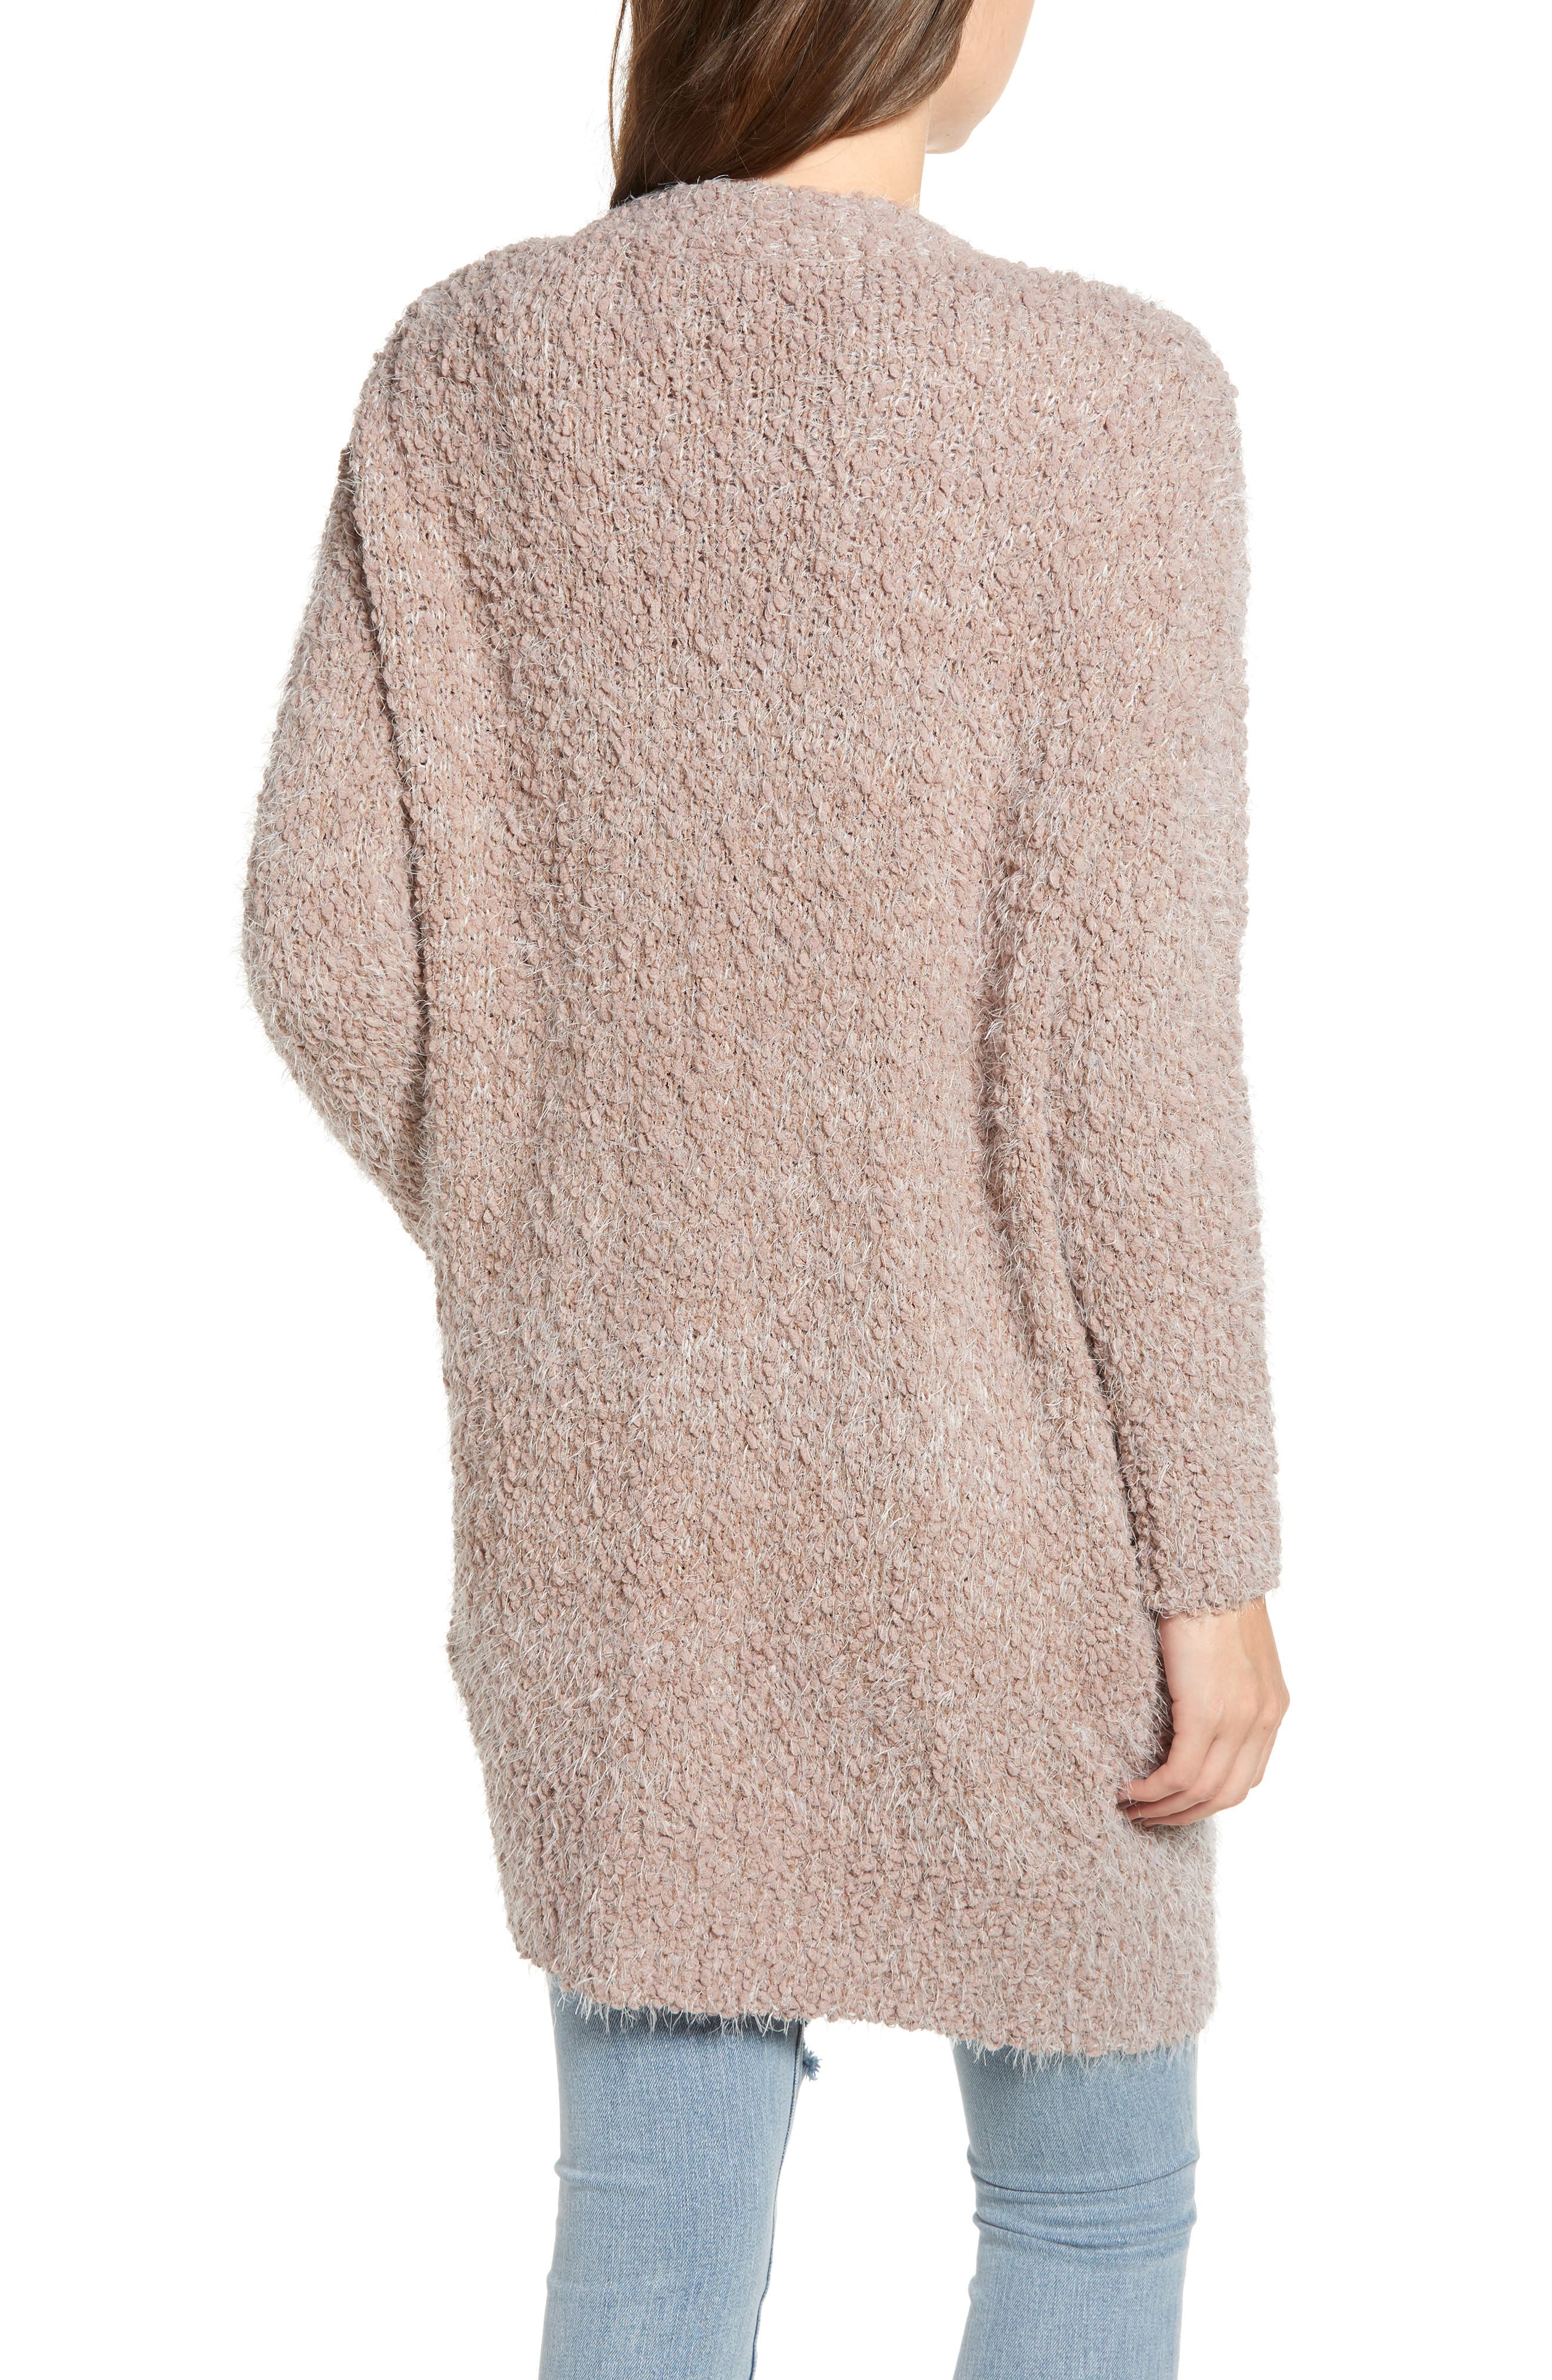 LIRA CLOTHING,                             Miranda Knit Cardigan,                             Alternate thumbnail 2, color,                             DUSTY ROSE